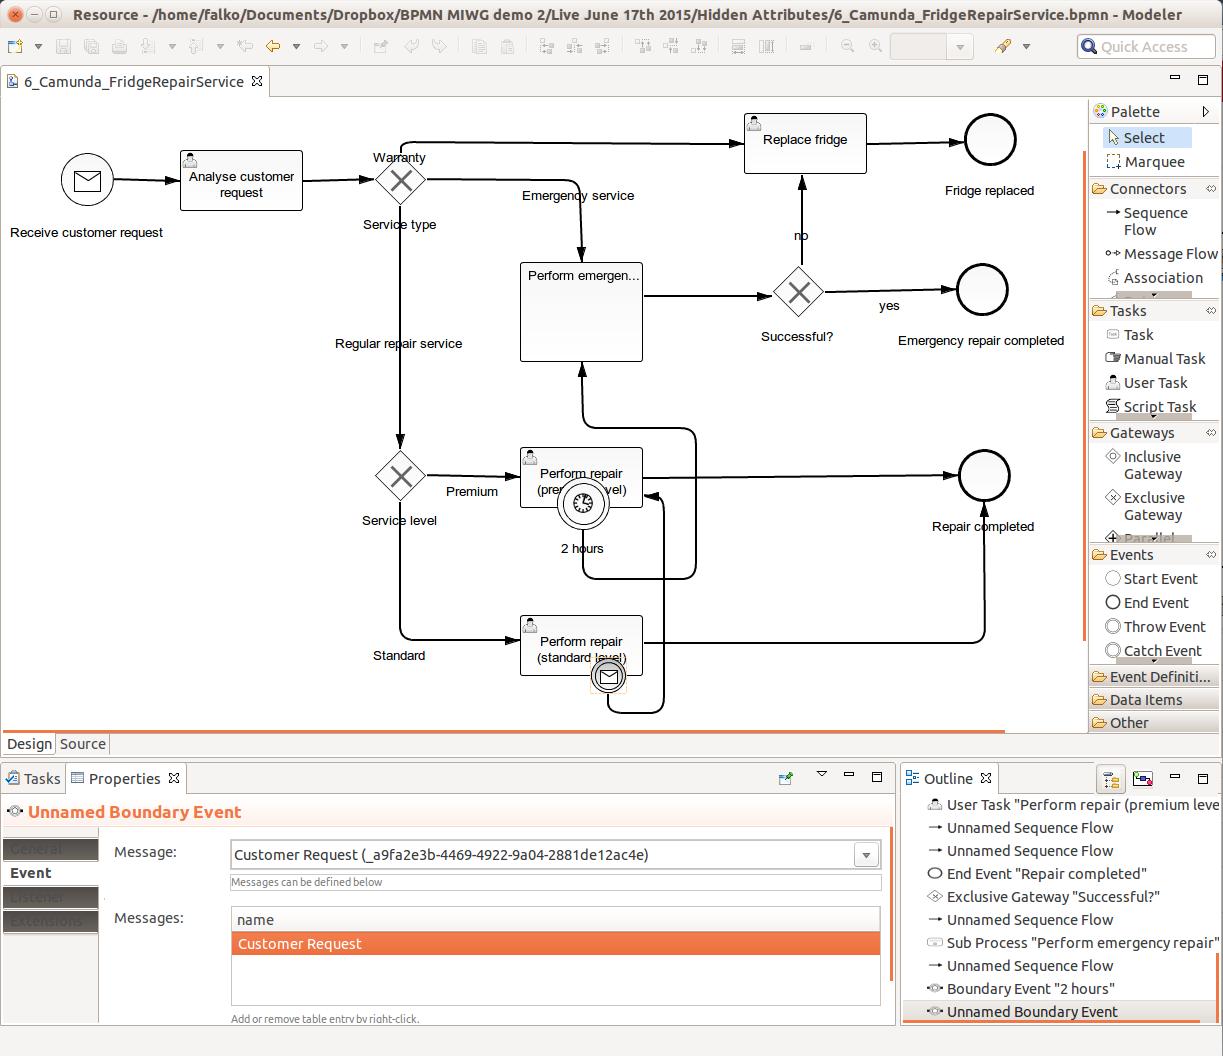 6_Camunda_FridgeRepairService.screenshot